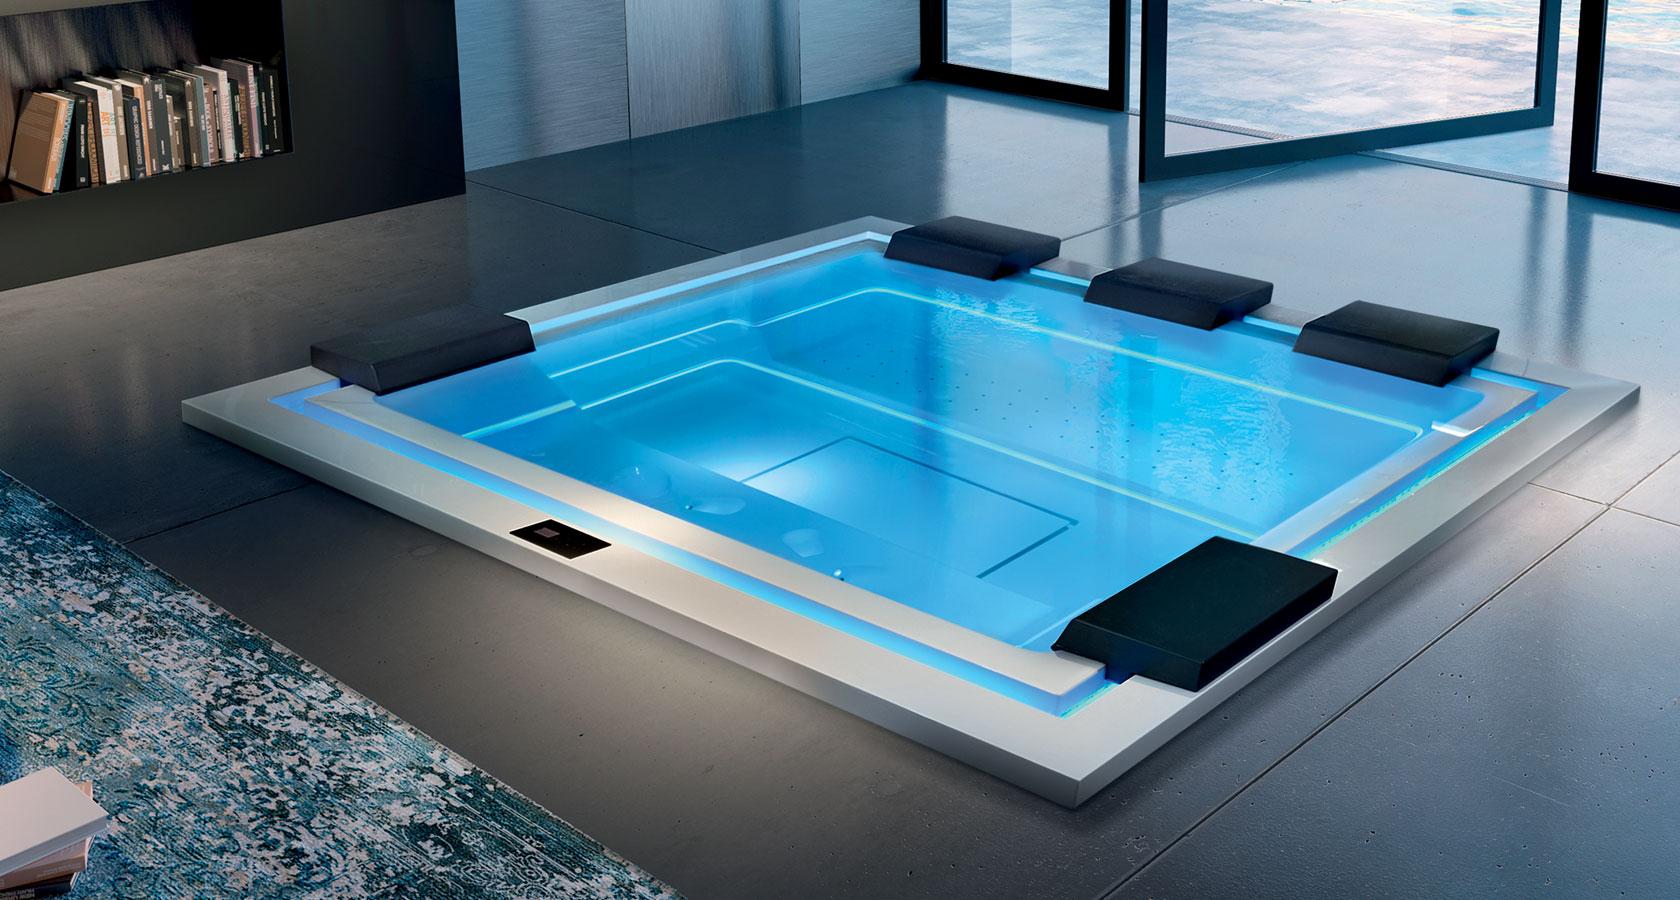 Whirlpool design whirl pools badipool schwimmbadtechnik - Design whirlpool ...